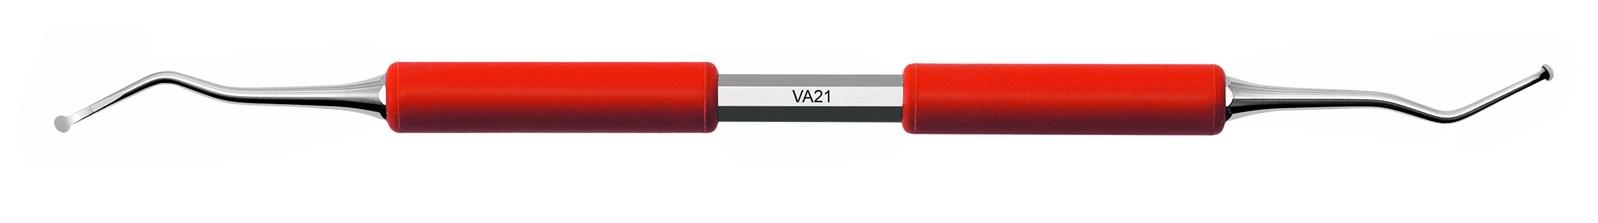 Chirurgická kyreta - VA21